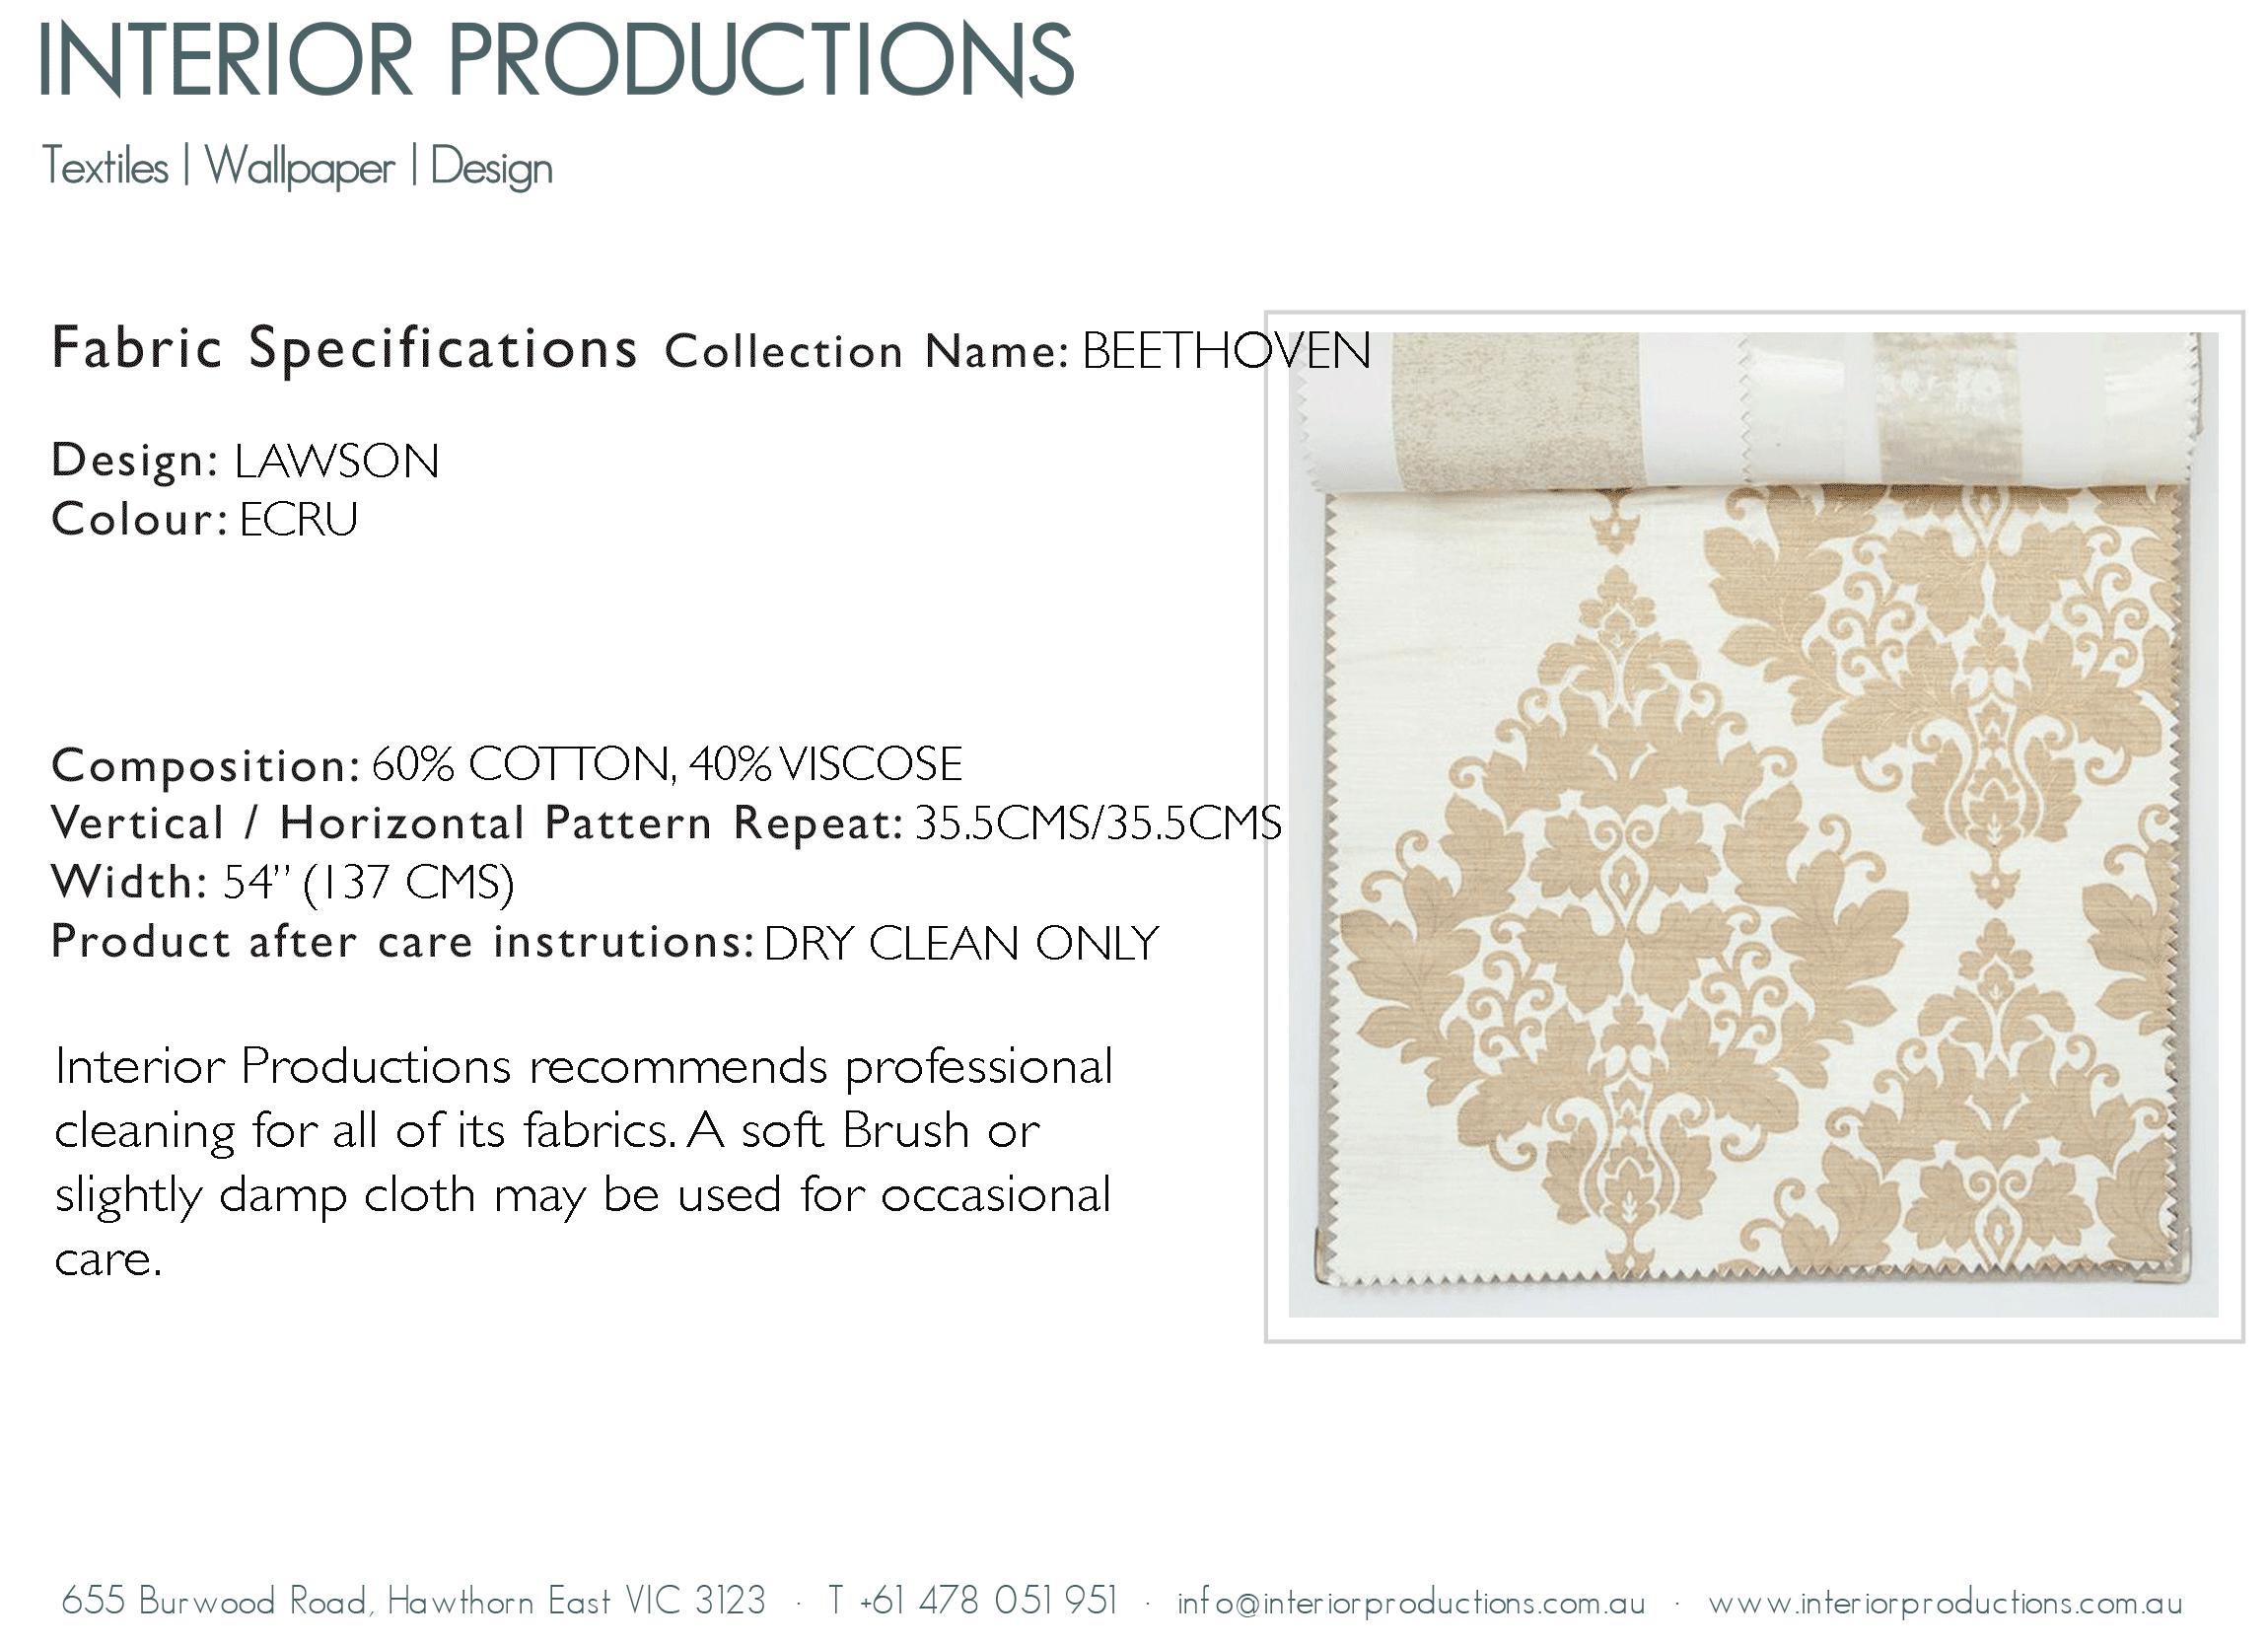 interior_productions_LAWSON---ECRU